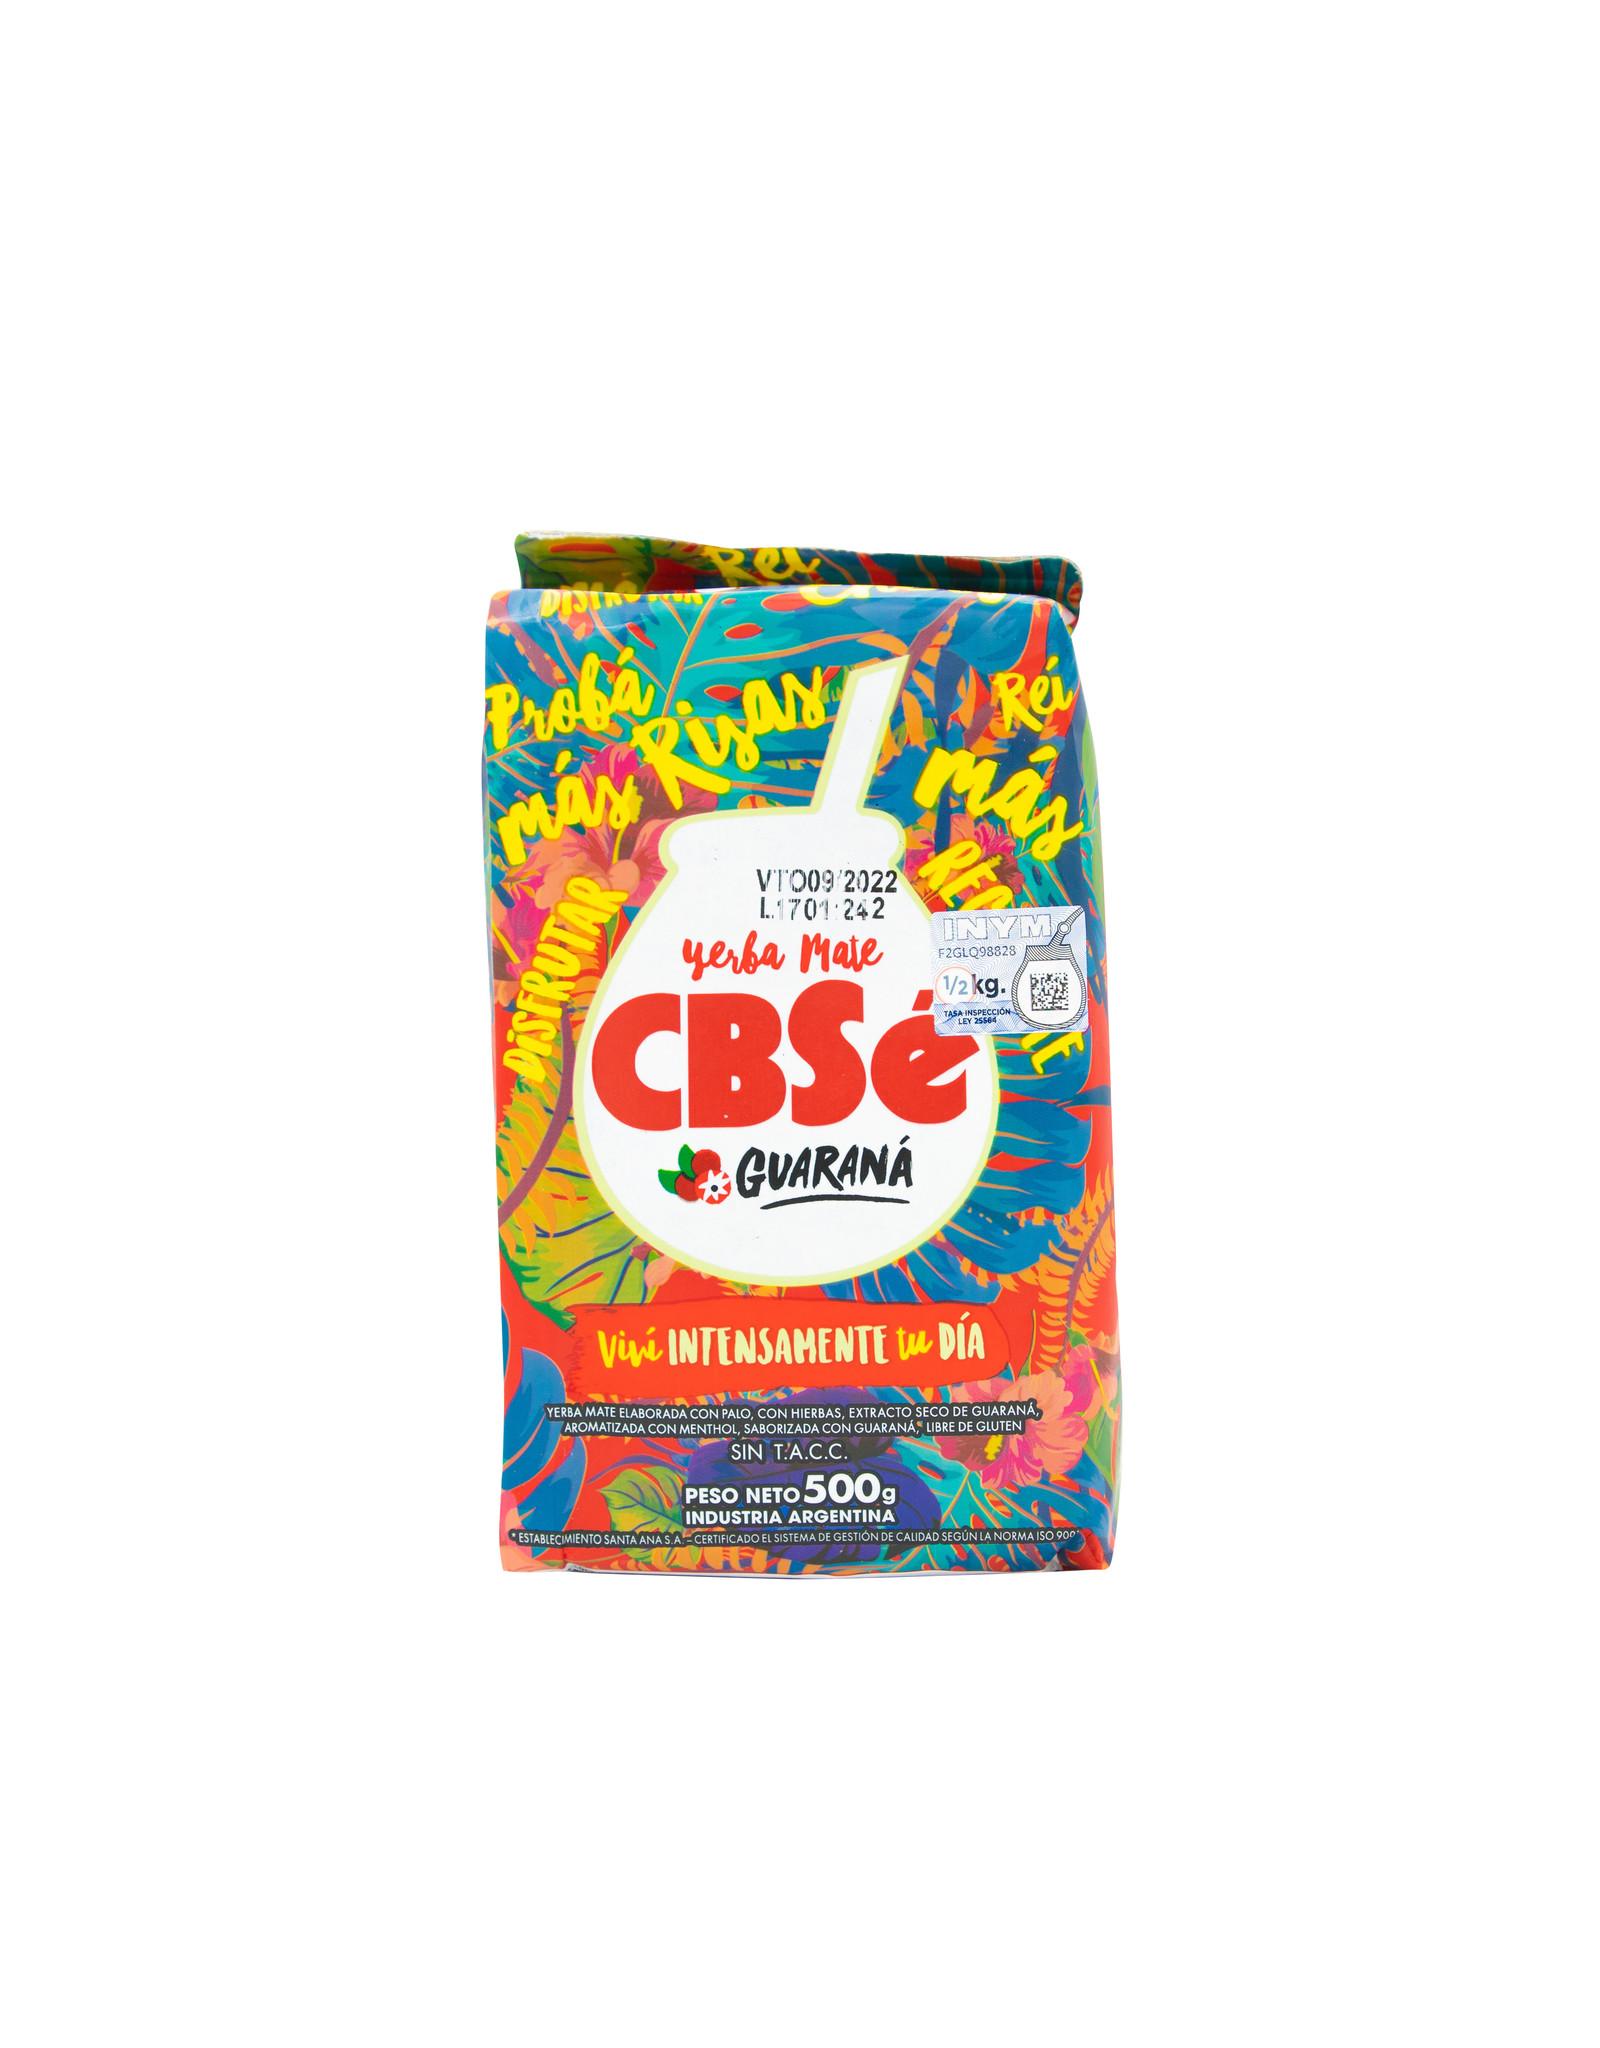 CBSé CBSé: Yerba mate guaraná